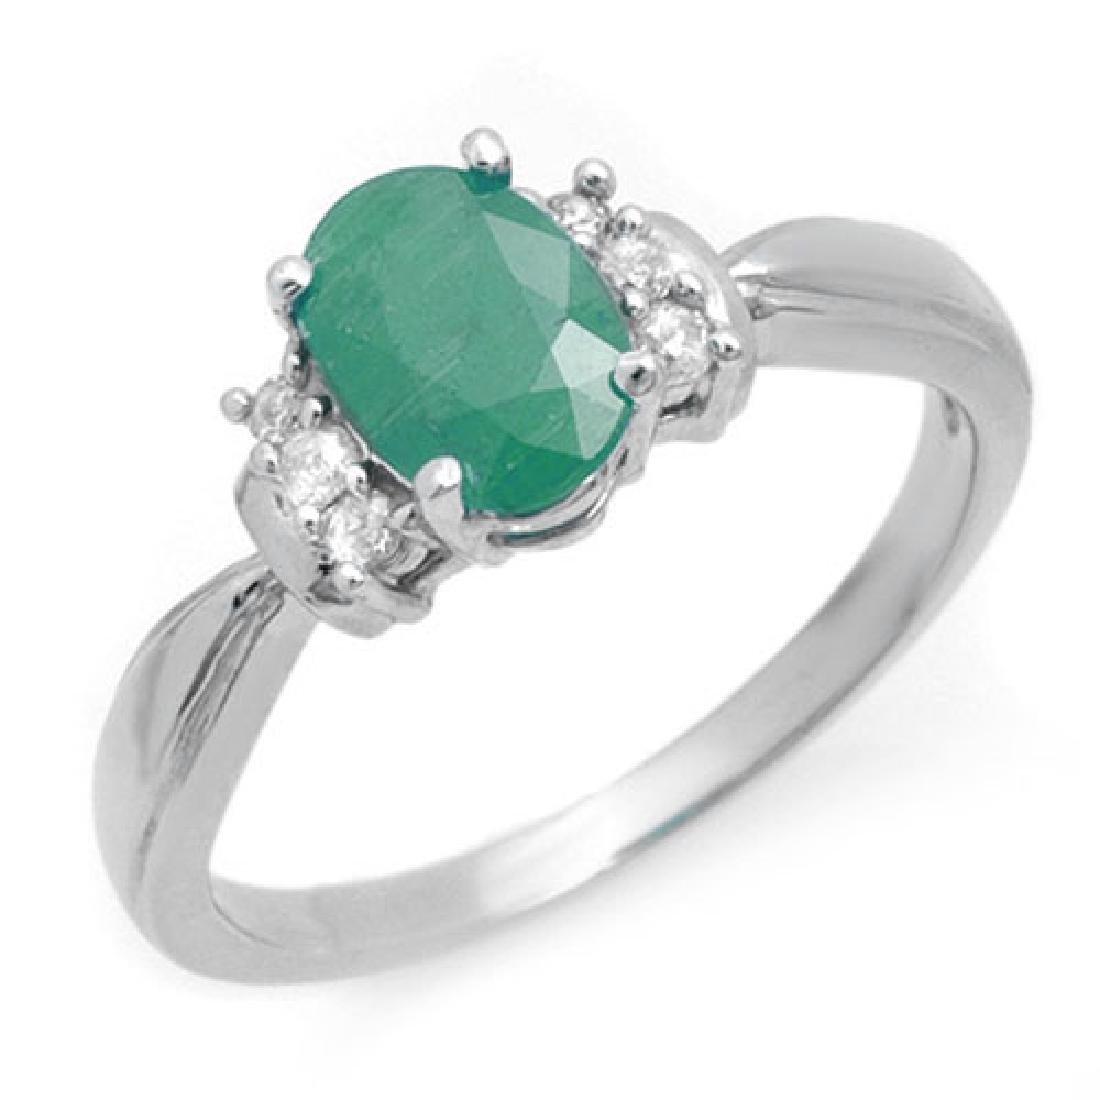 1.0 CTW Emerald & Diamond Ring 14K White Gold